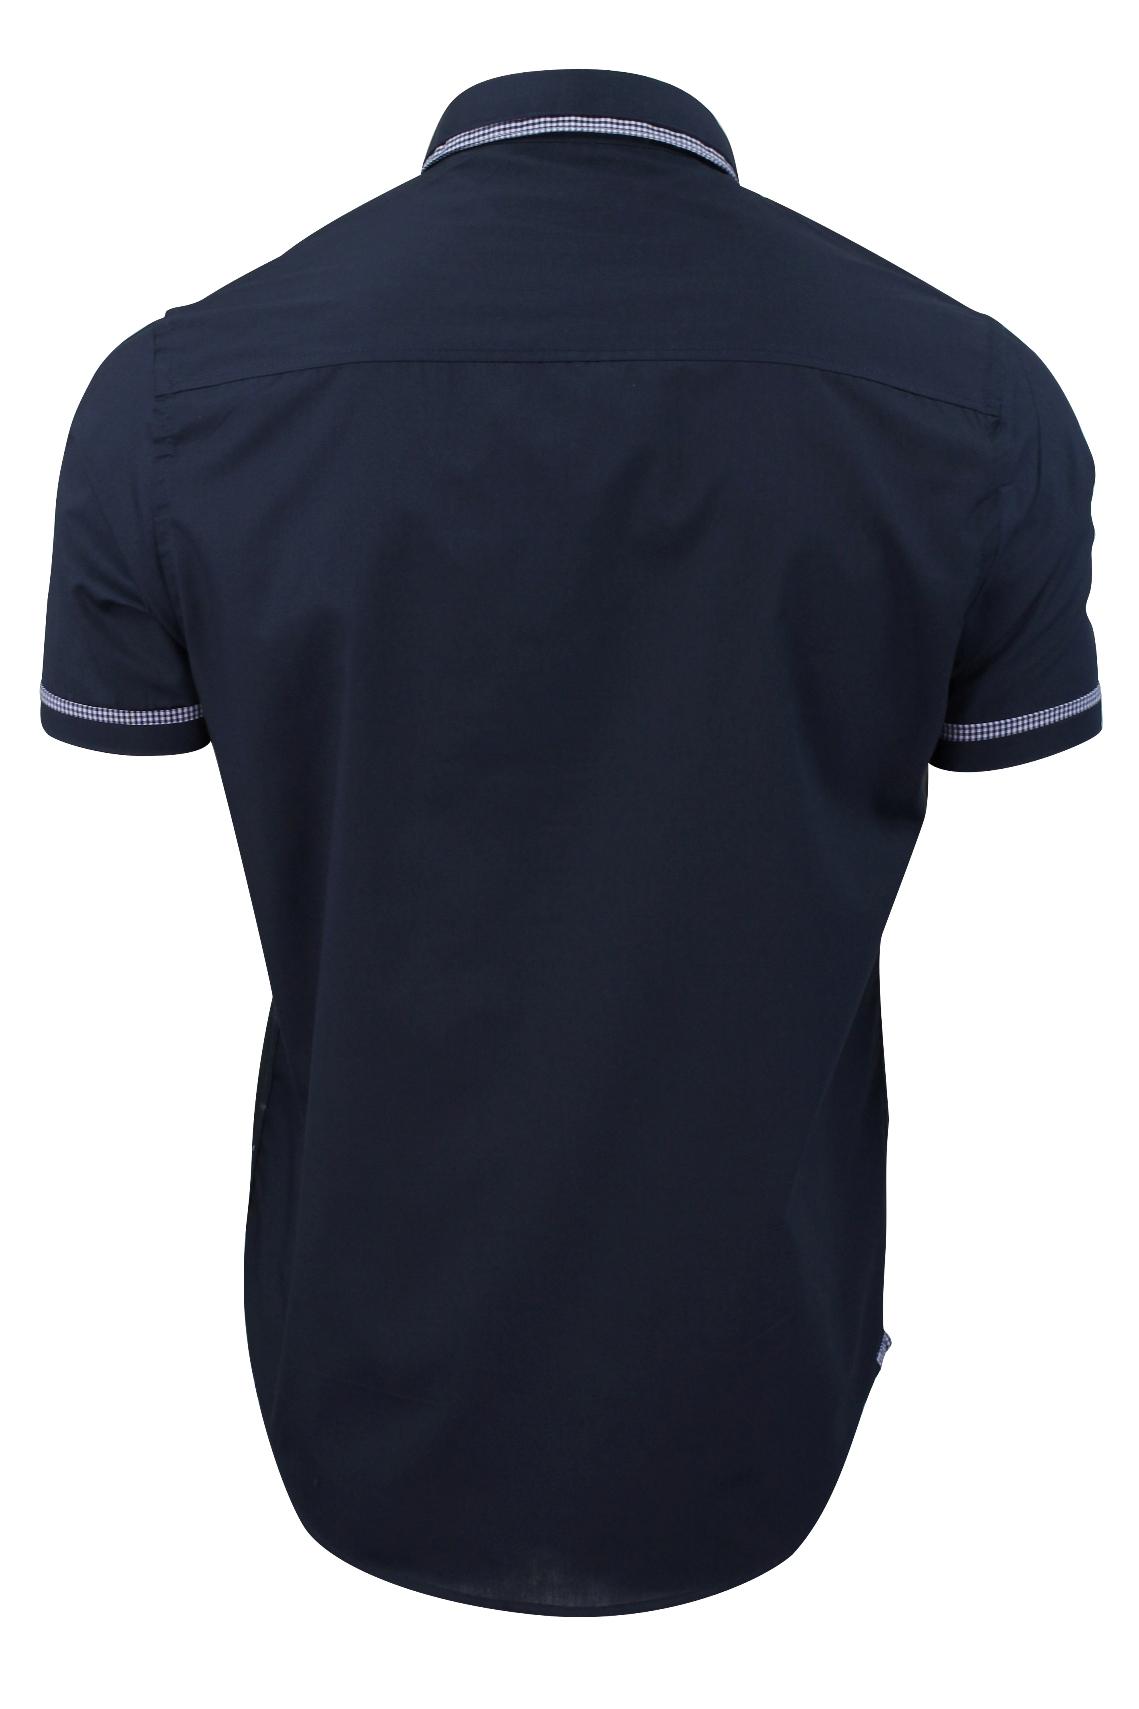 Mens-Shirt-by-Brave-Soul-039-Colvin-039-Gingham-Trim-Short-Sleeved thumbnail 7